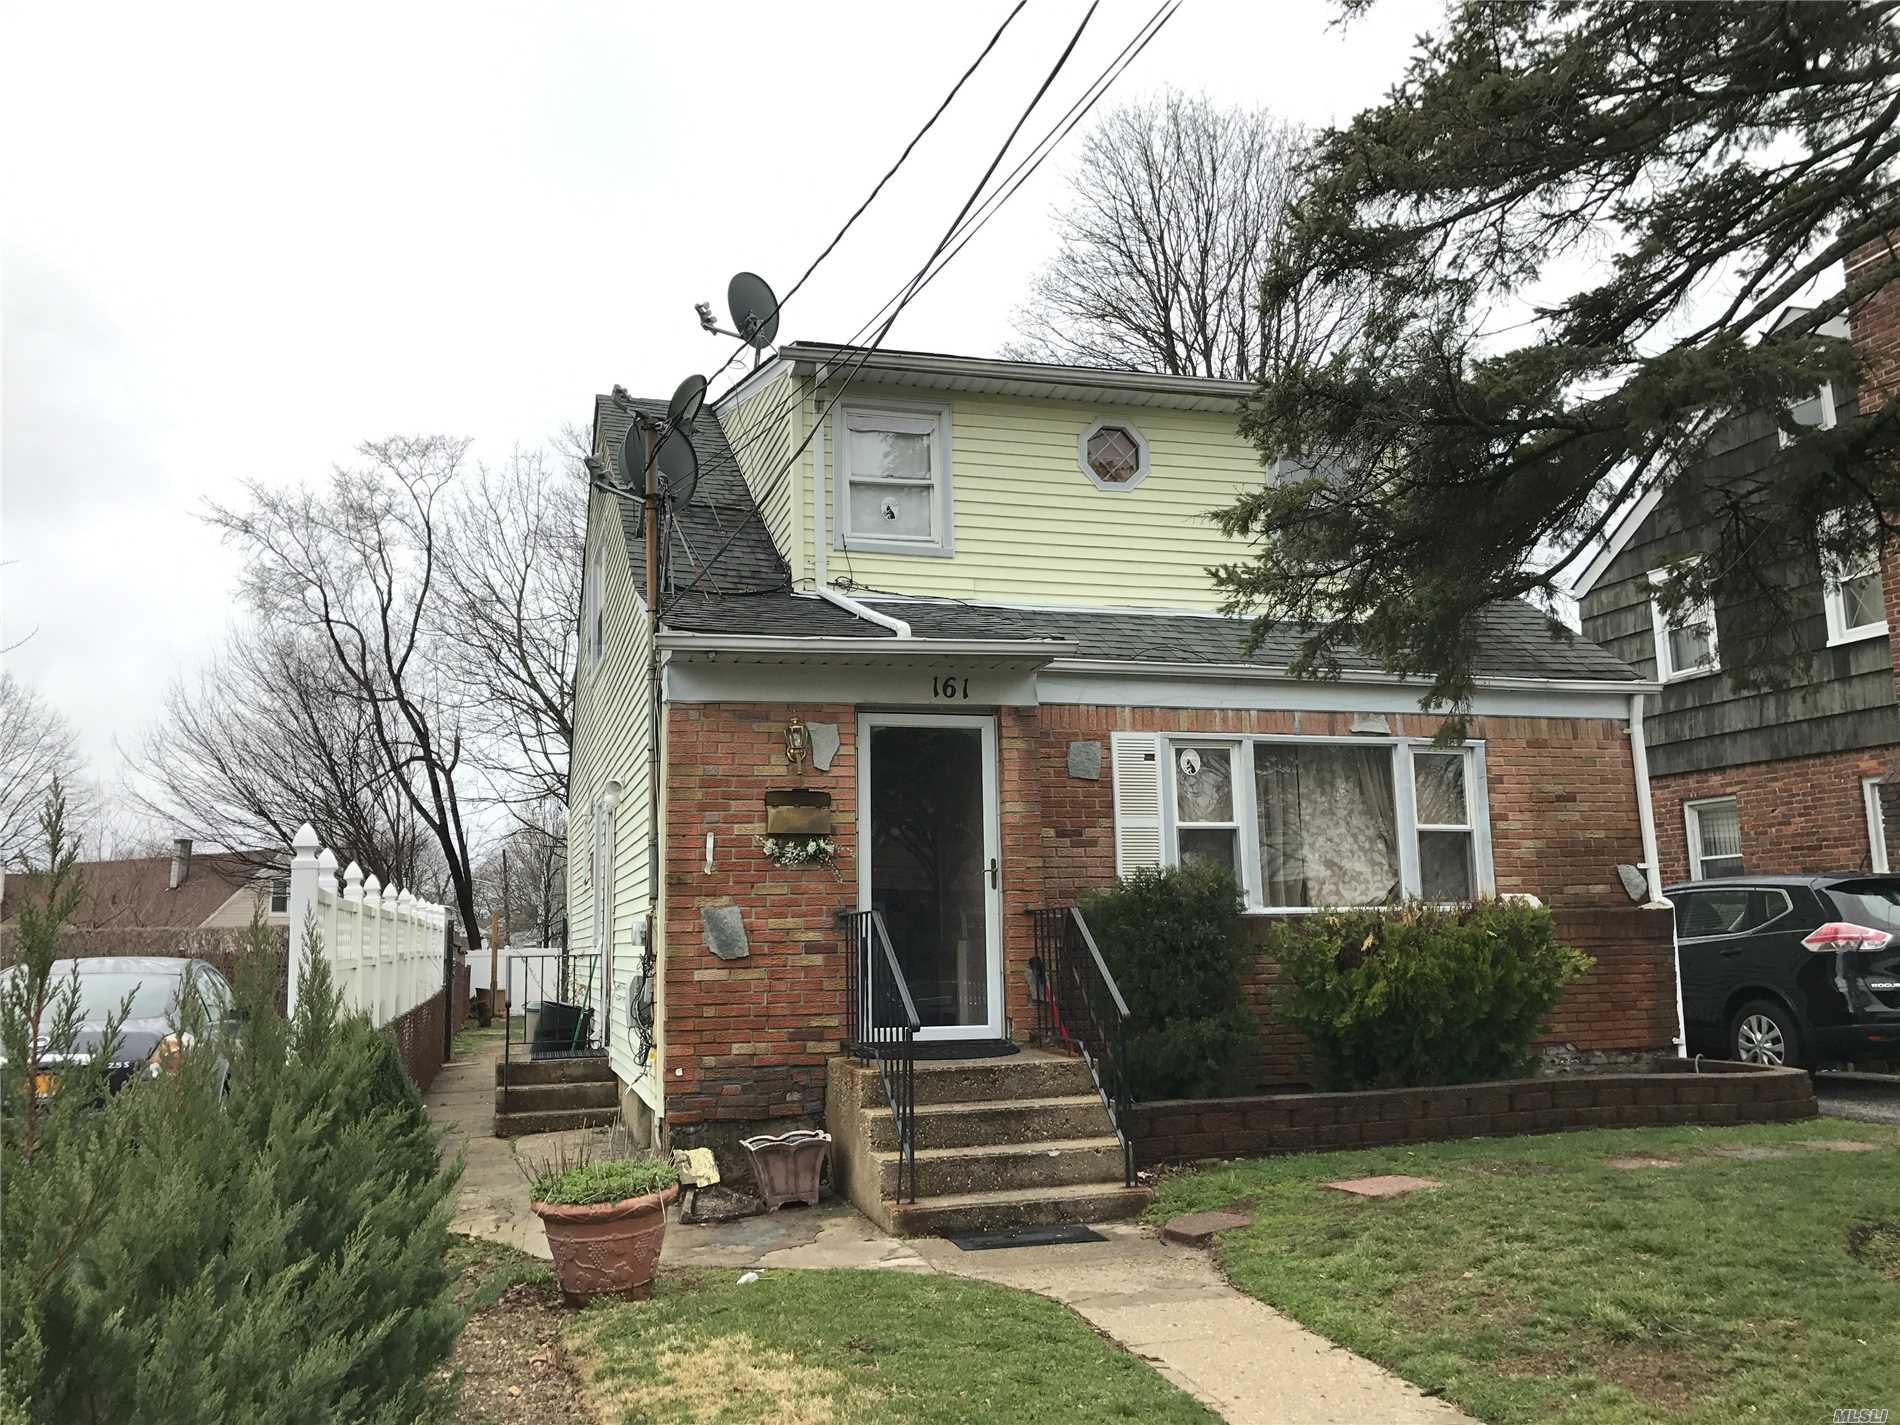 161 Fairview Blvd - Hempstead, New York